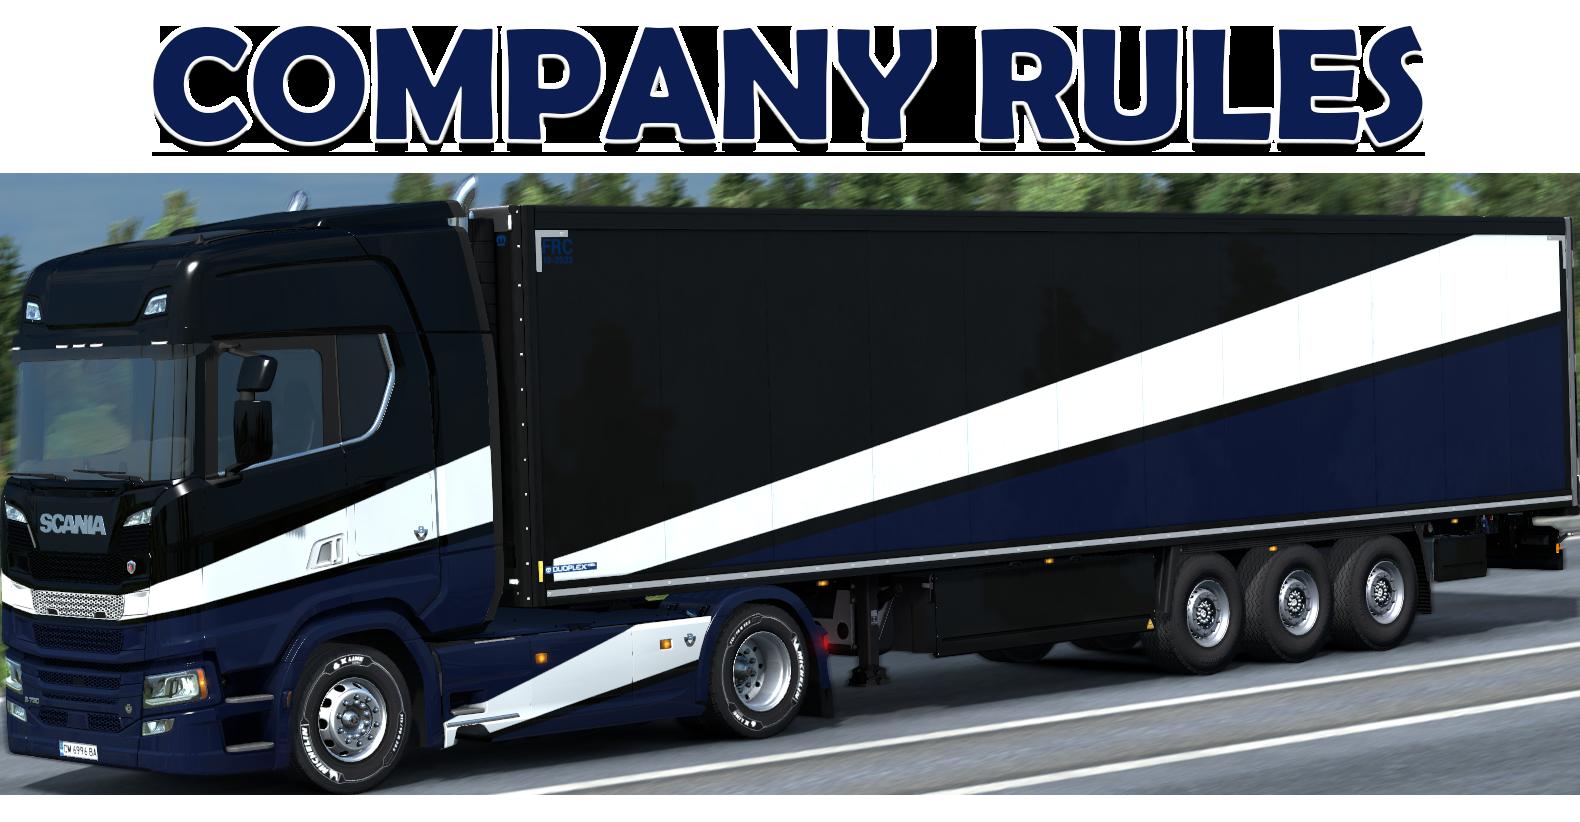 CompanyRules